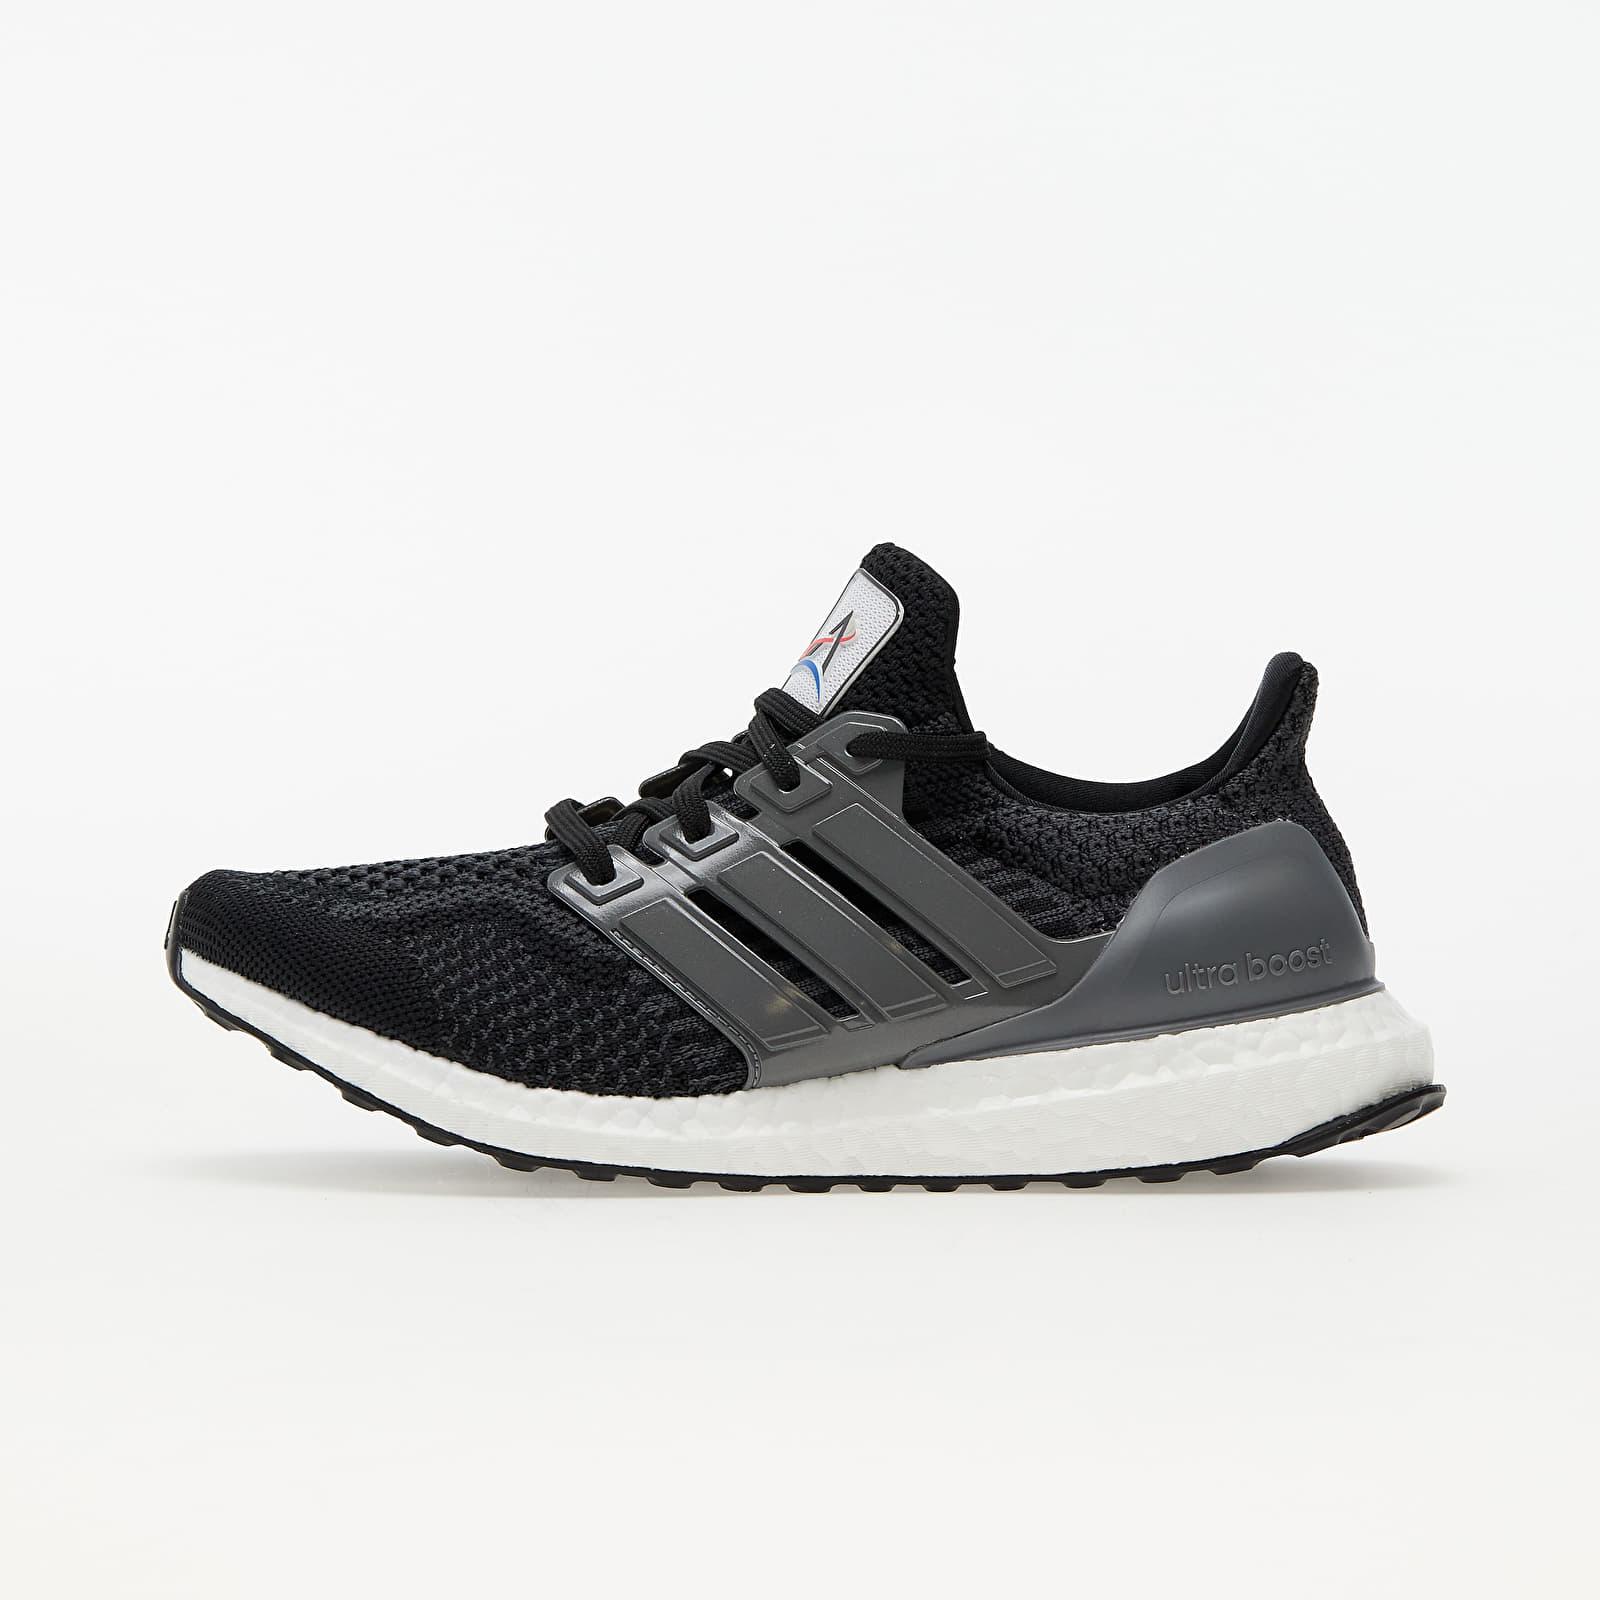 adidas UltraBOOST 5.0 DNA W Core Black/ Iron Metalic/ Carbon FZ1853